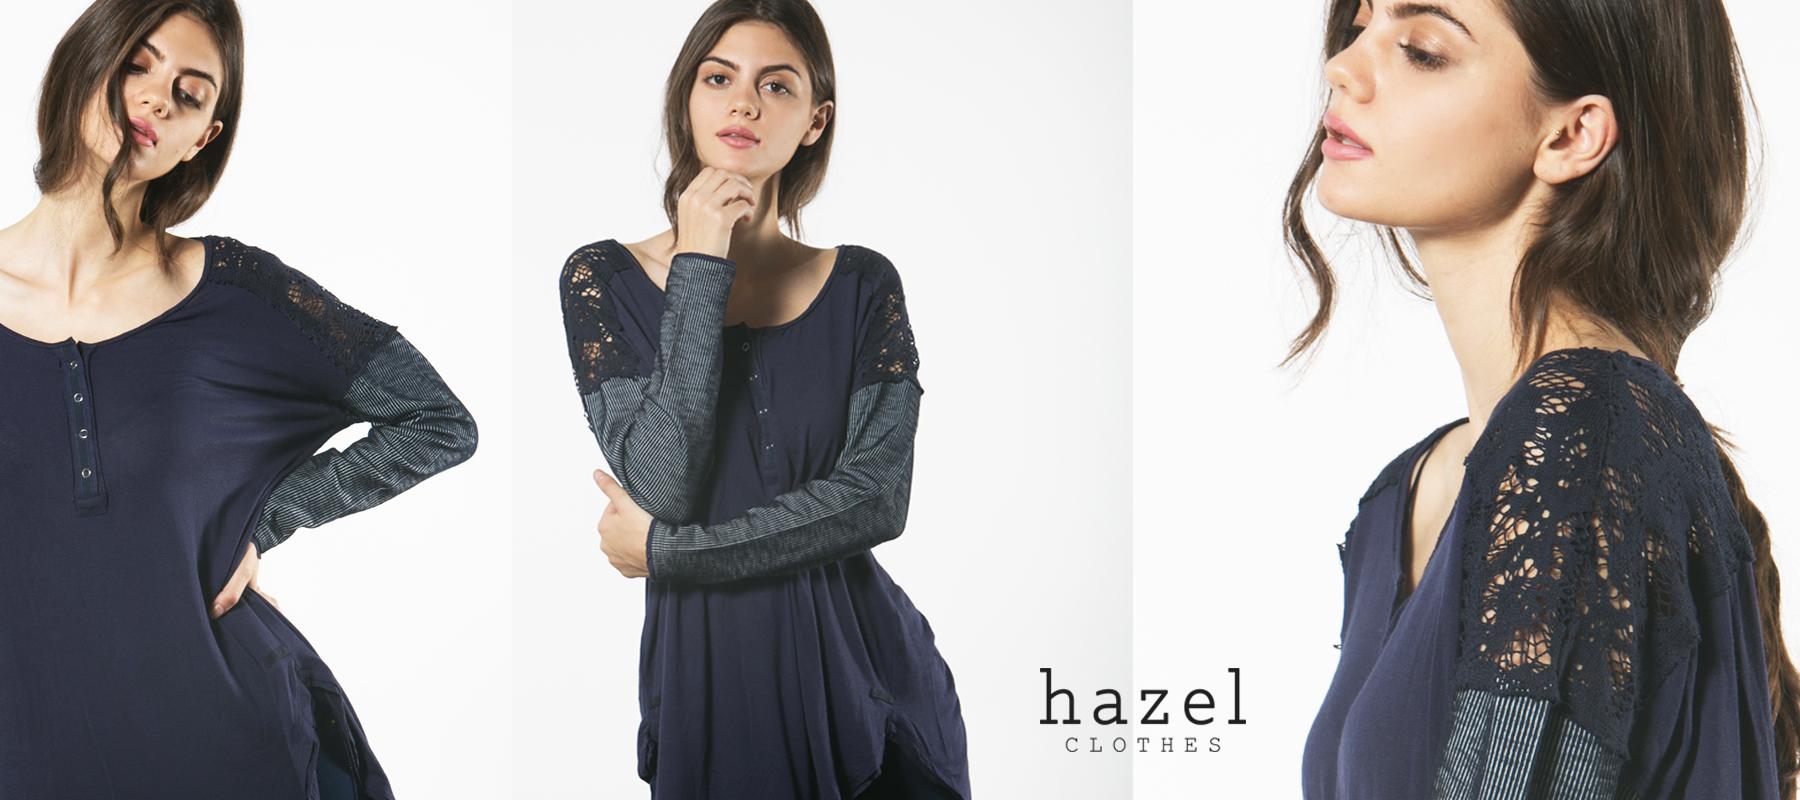 hazel clothes slide3